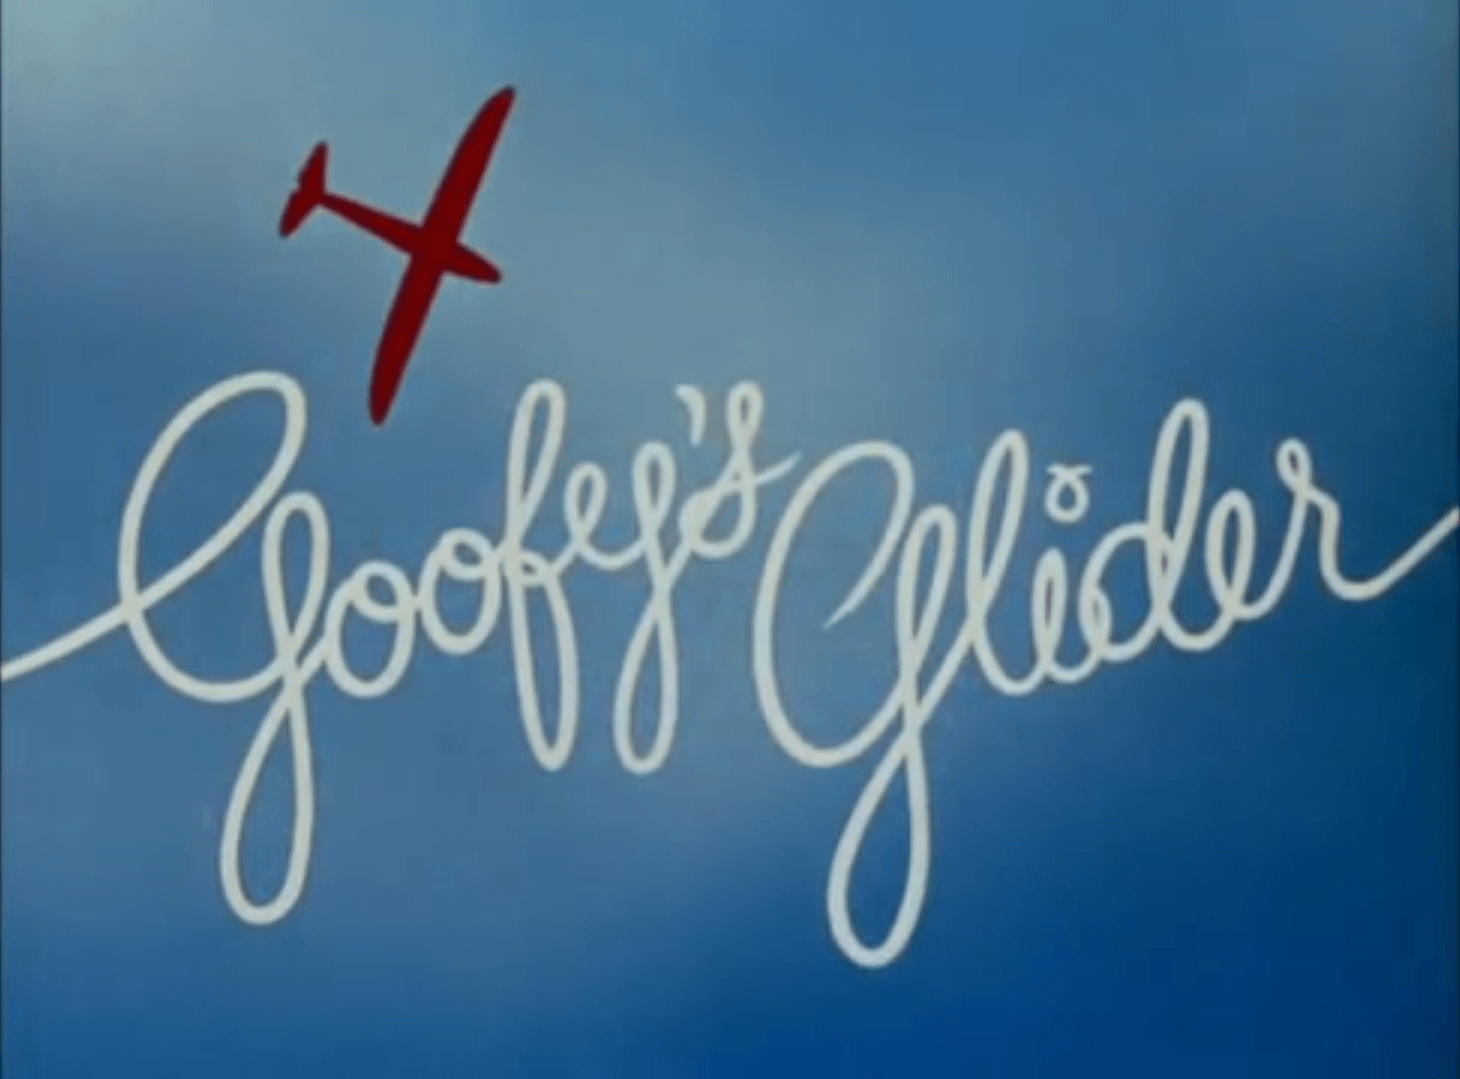 Goofy's Glider (Jack Kinney, Lou Debney, 1940)